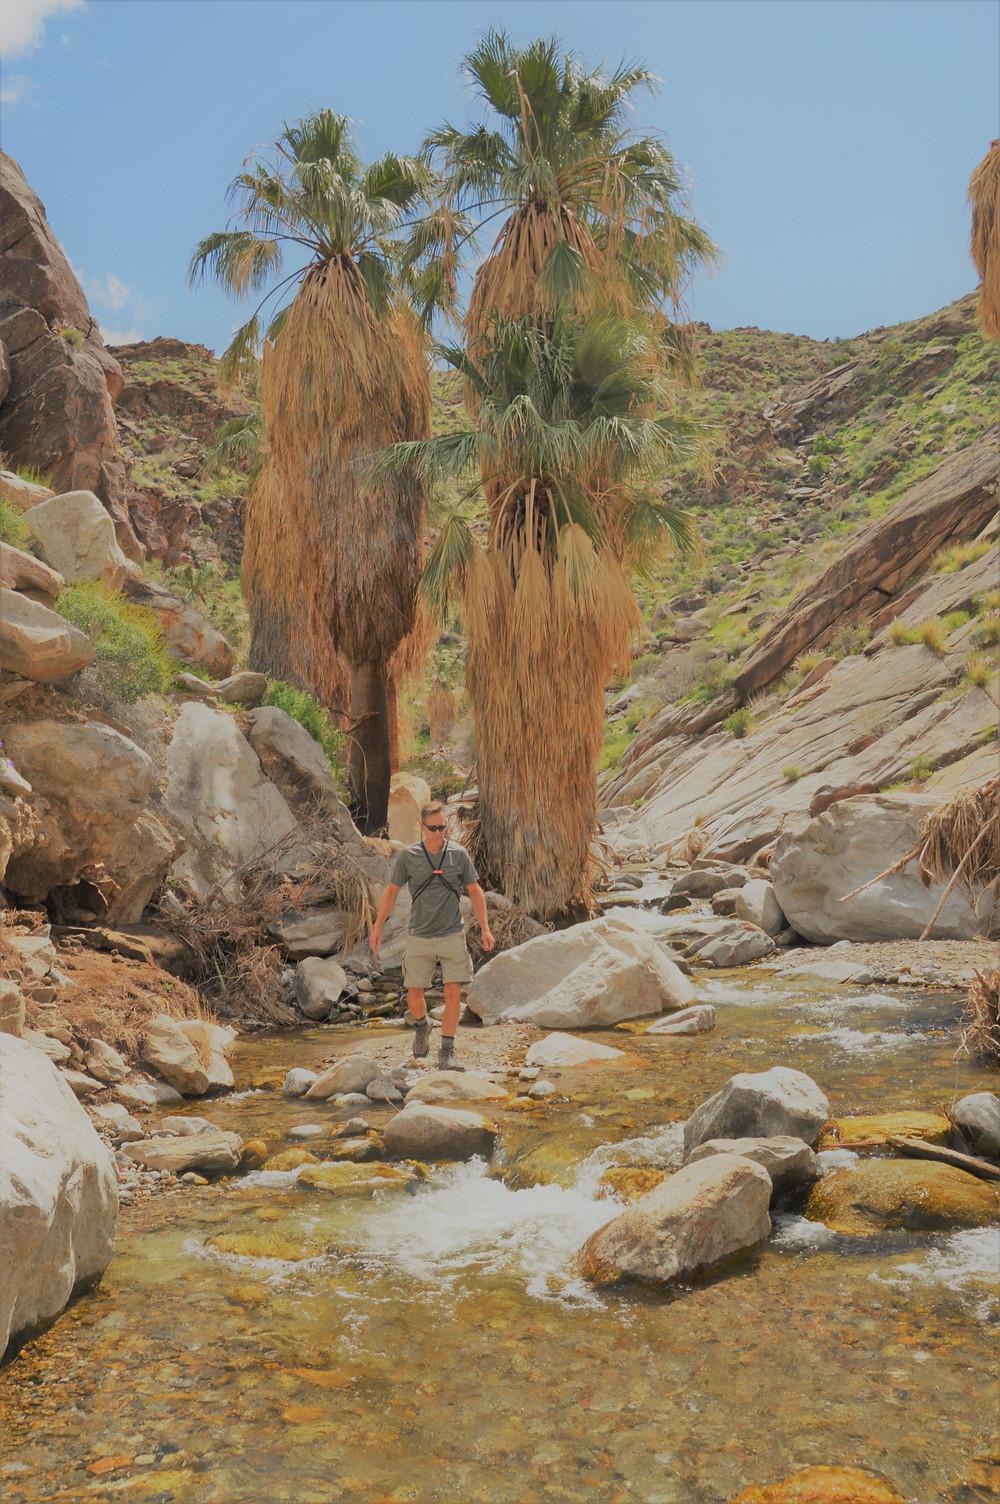 Washingtonia filifera or California fan palm palms grow along the waters edge in Murray Canyon in Agua Caliente Reservation